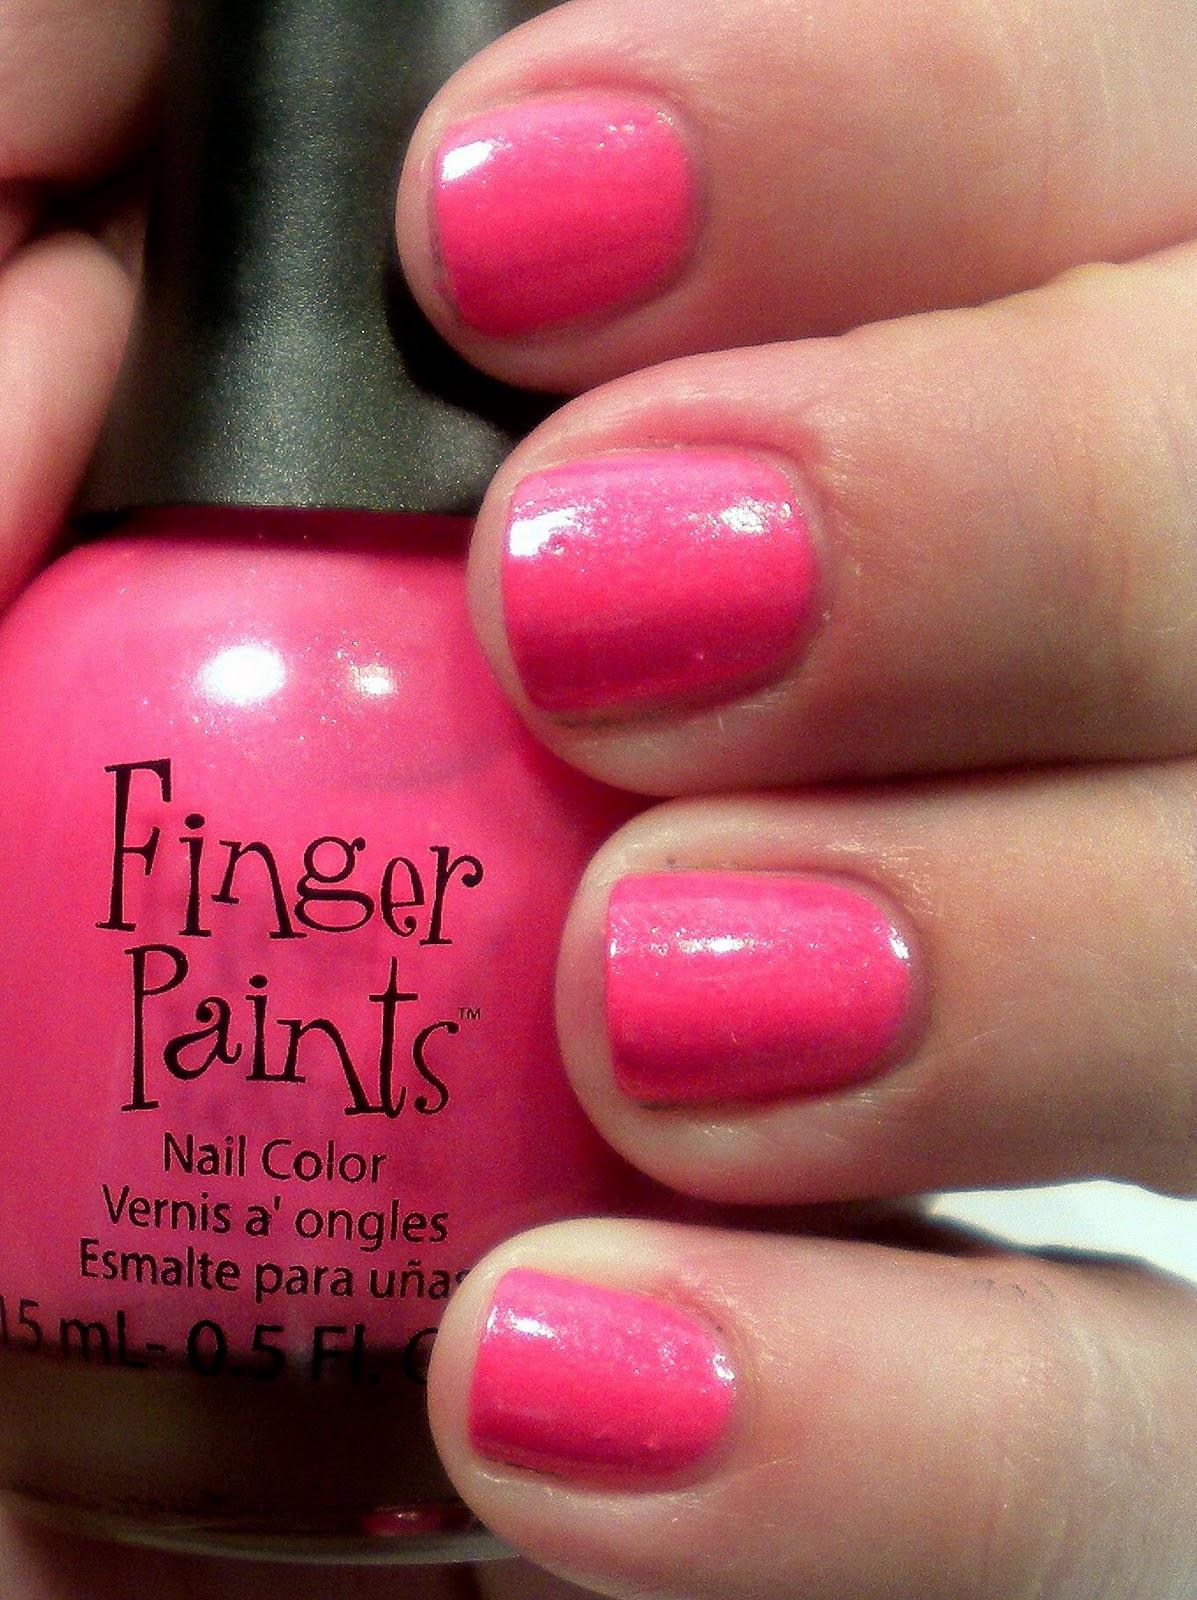 Finger Paints Nail Polish Review